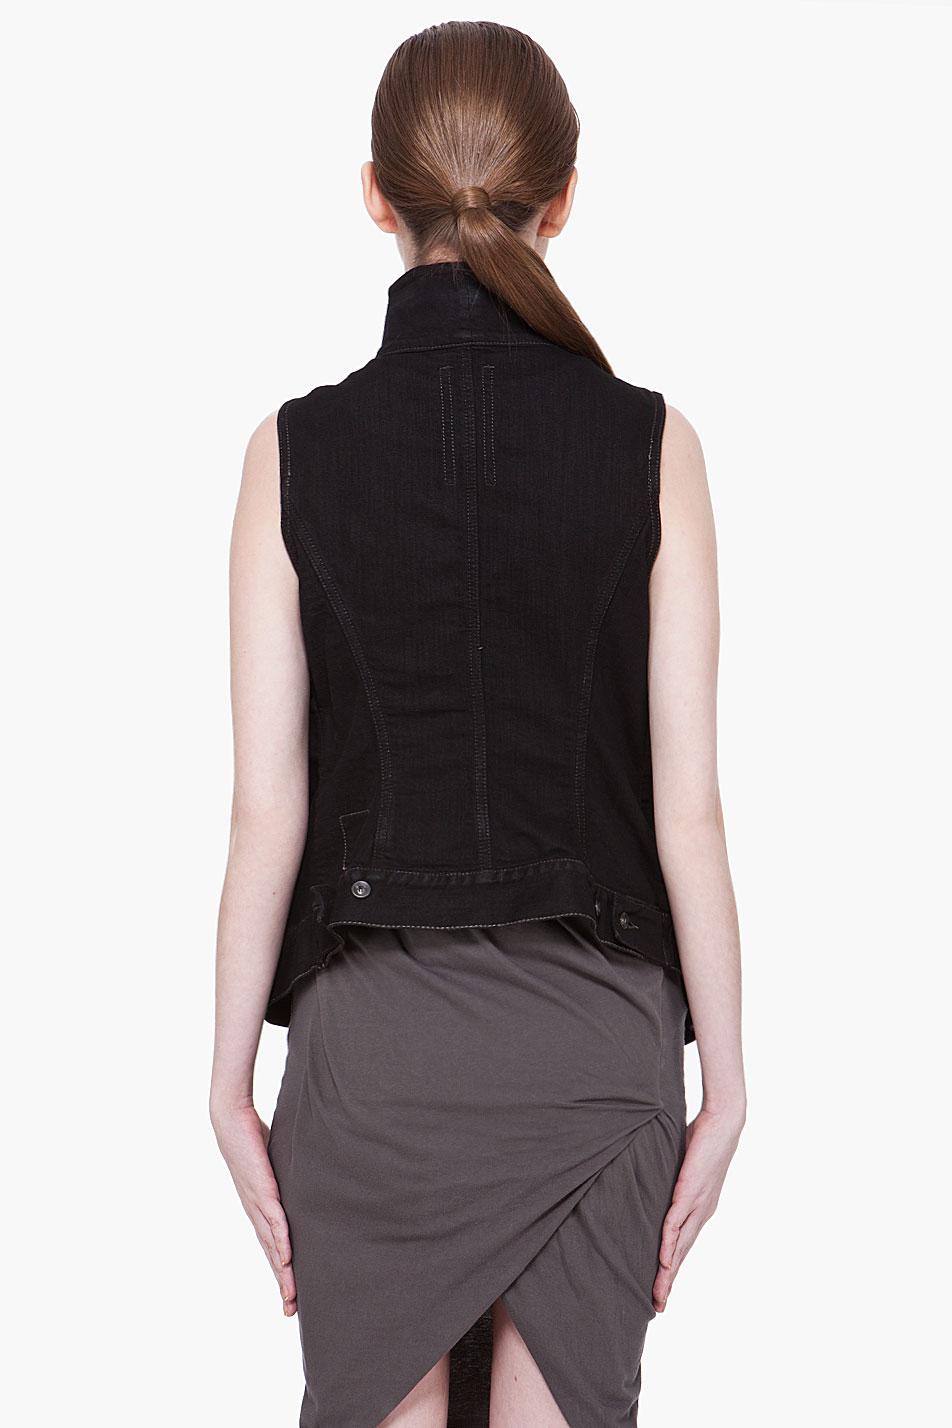 black vest and jeans - photo #31